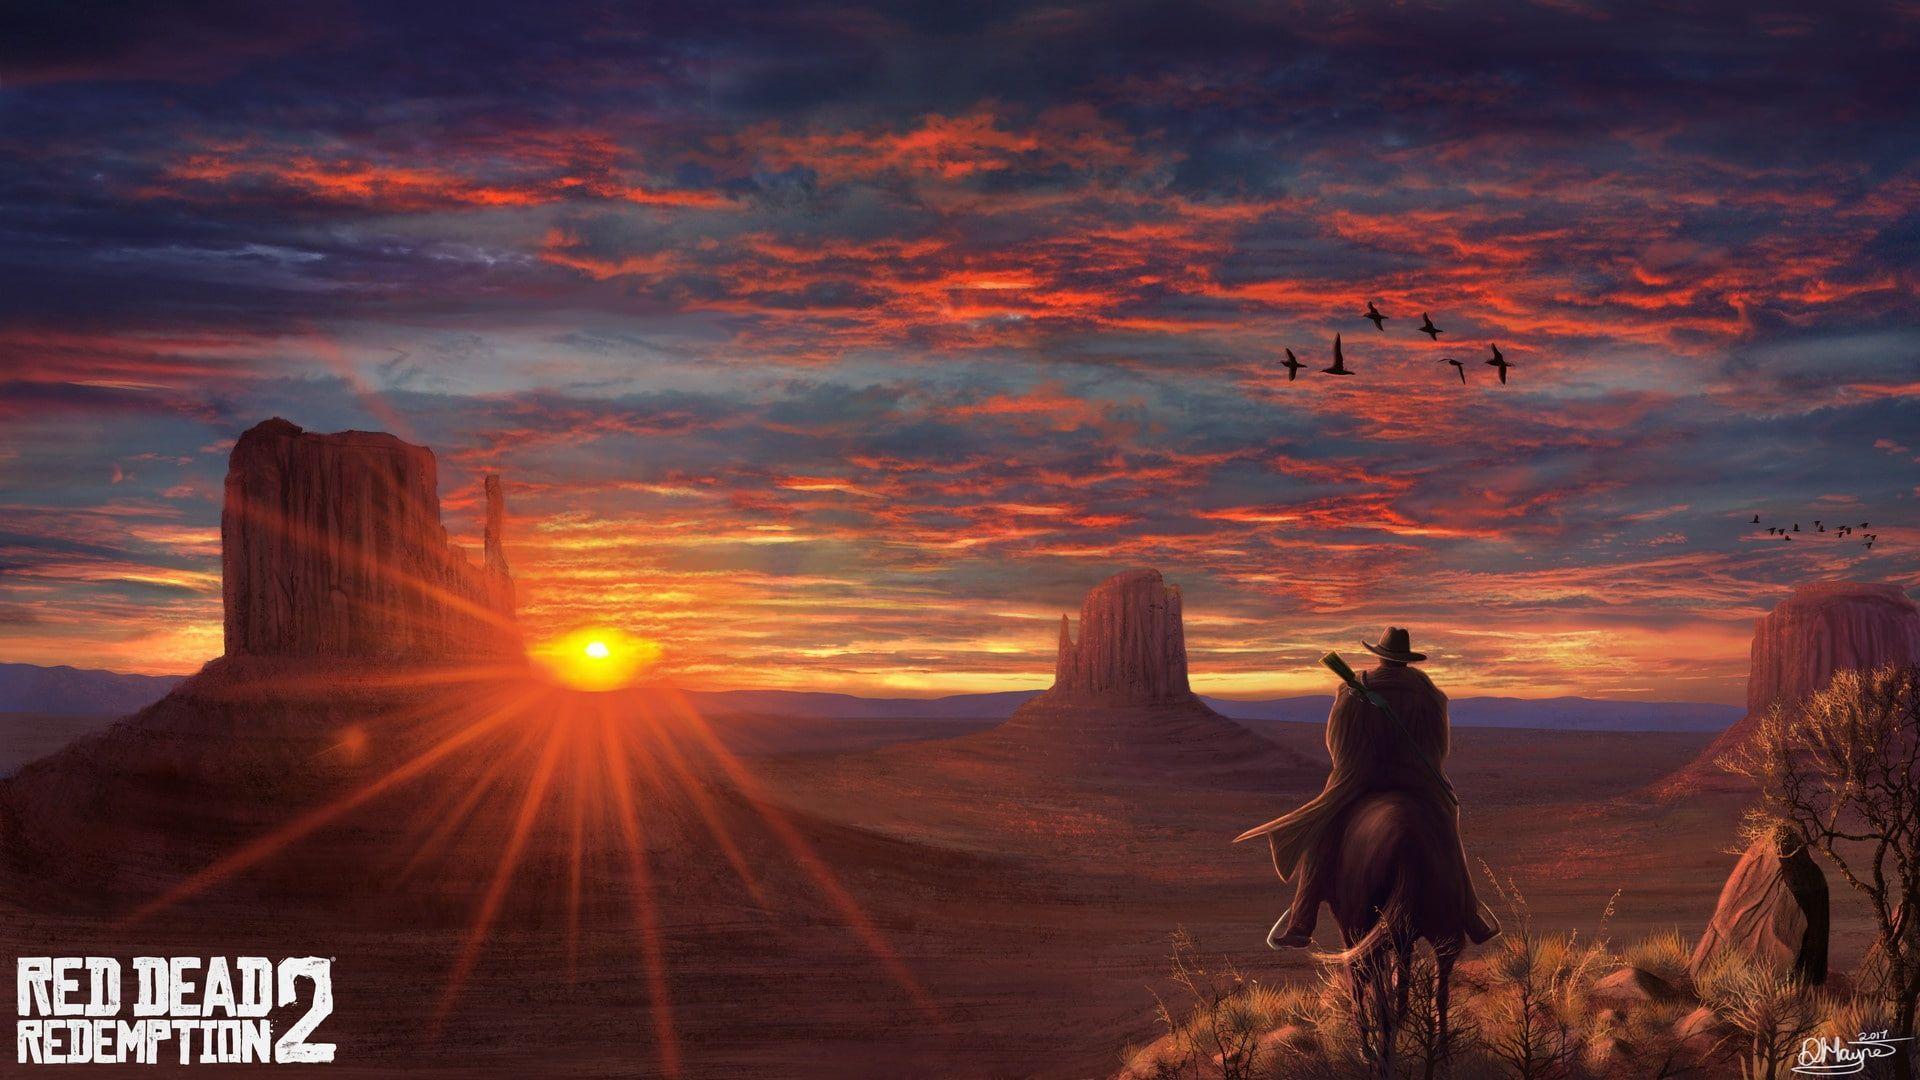 Sunset The Game Art Rockstar Concept Art Cowboy Western Game Art Red Dead Redemption 2 Red Dead Redemption Art Red Dead Redemption Red Dead Redemption 1